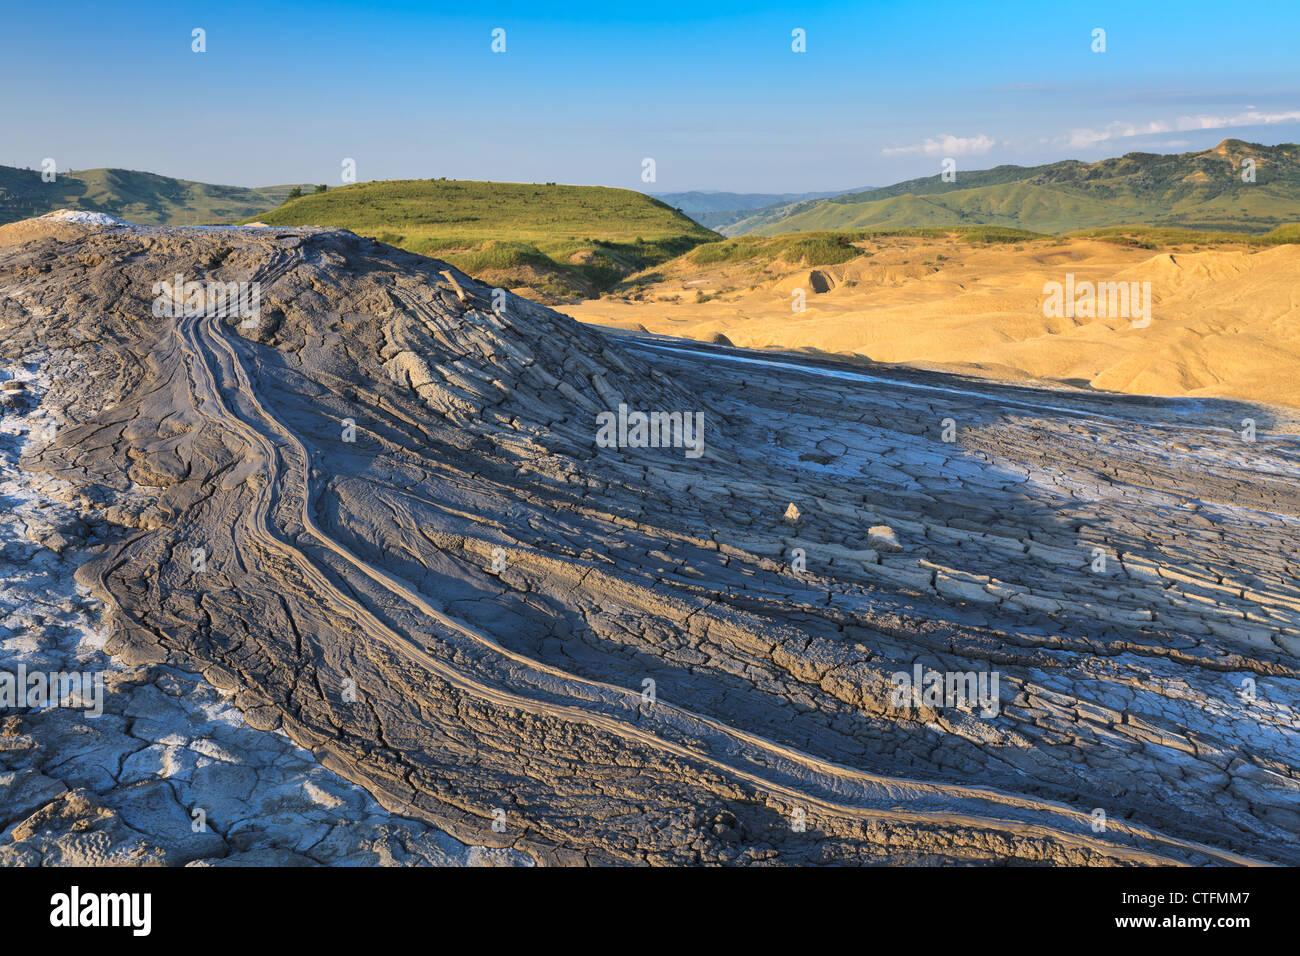 Mud Volcanoes in Buzau, Romania - Stock Image